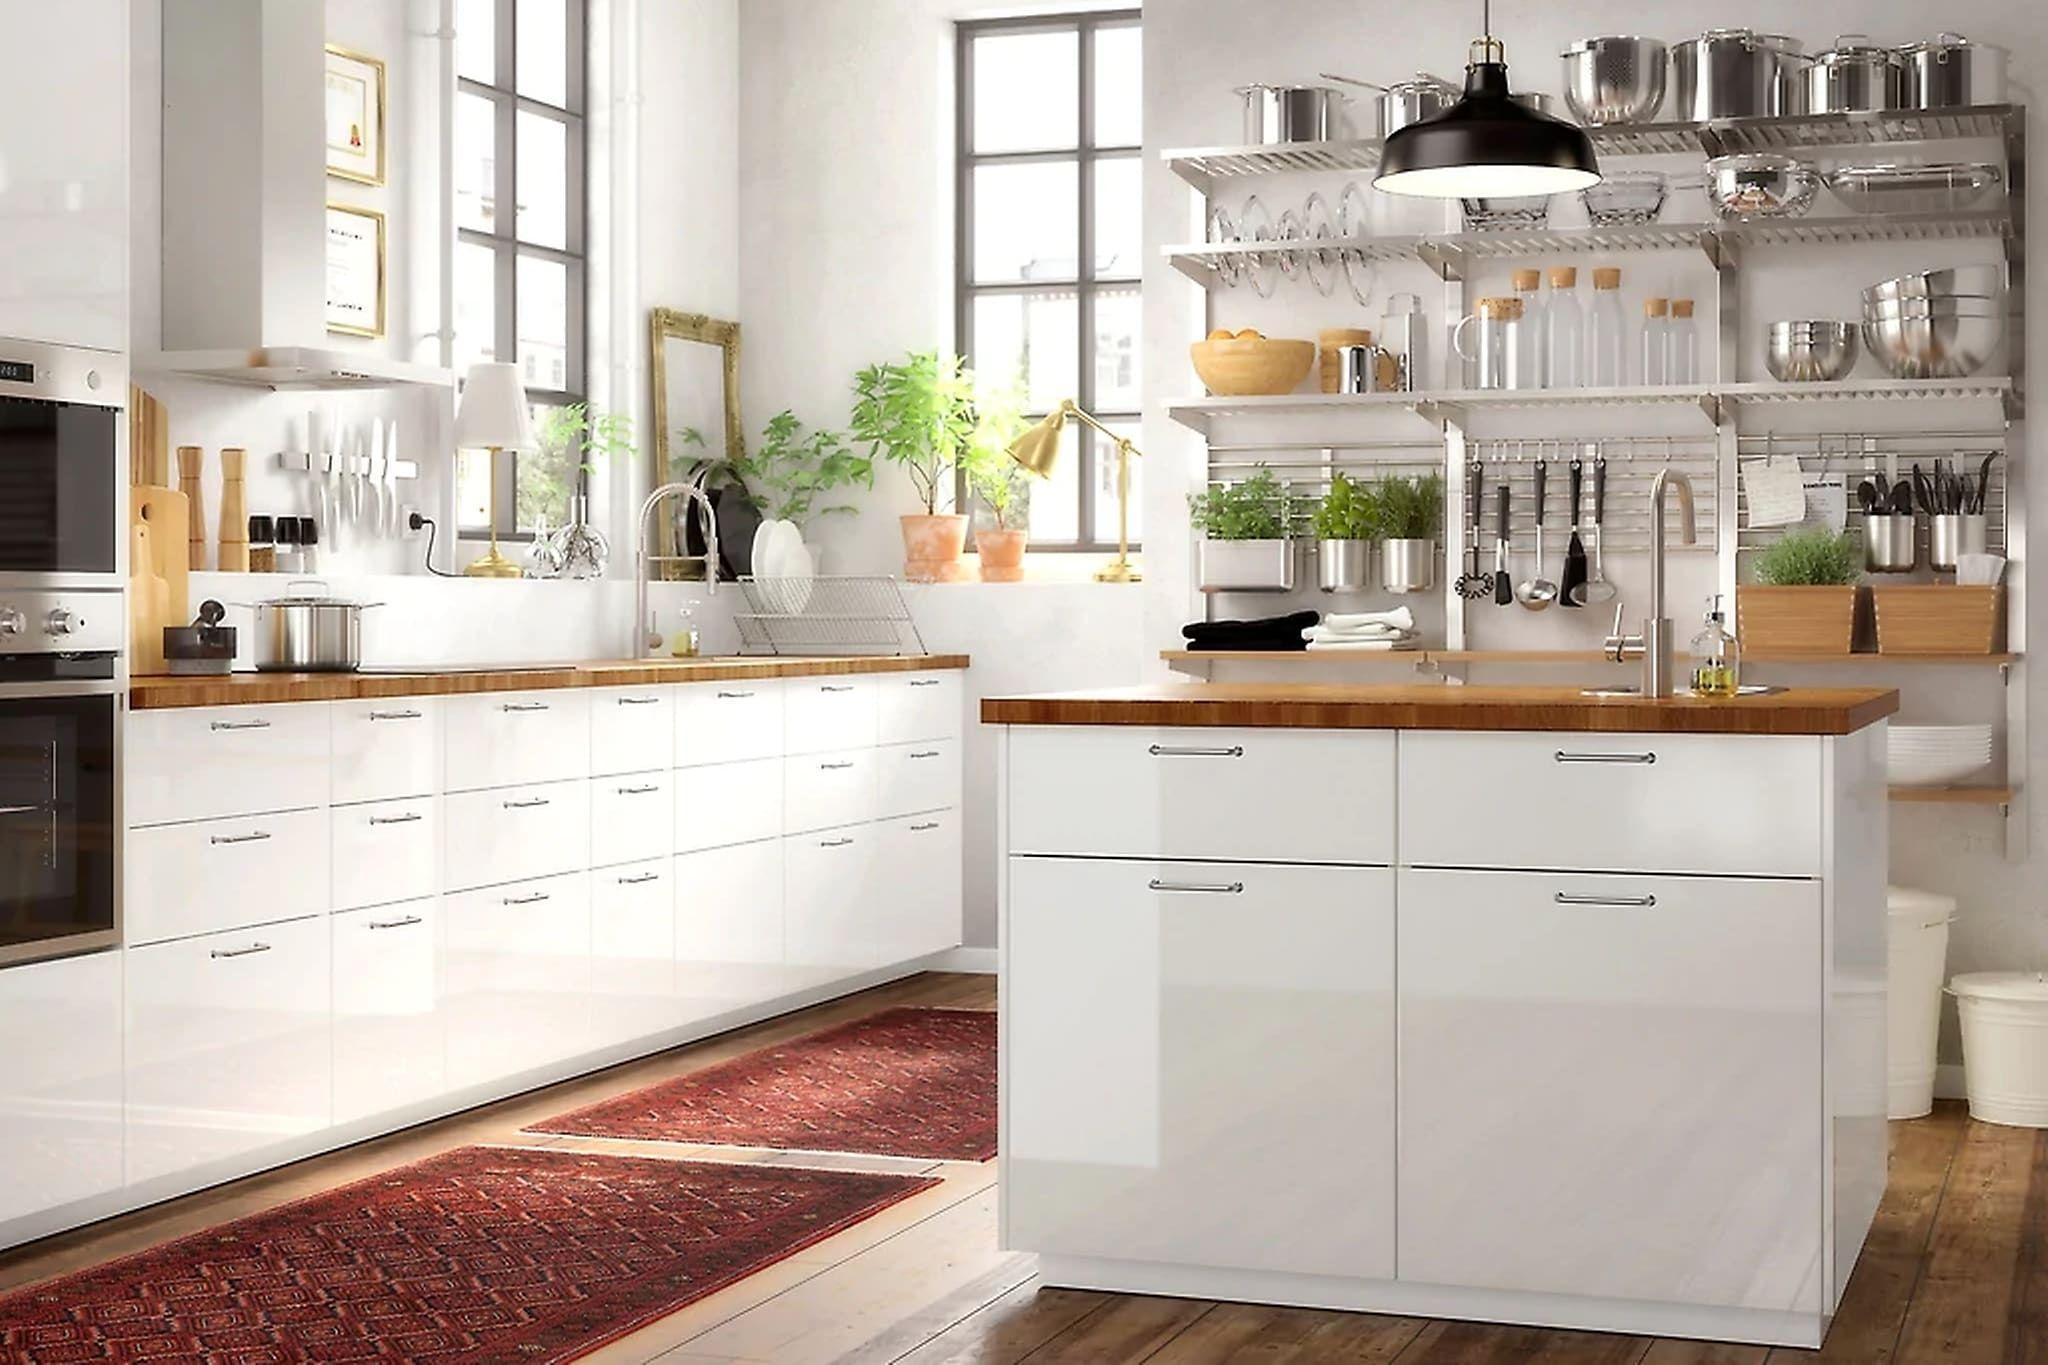 Keuken Ikea Open : Ikea keukens een keuken nee jow keuken durchgehend keuken design